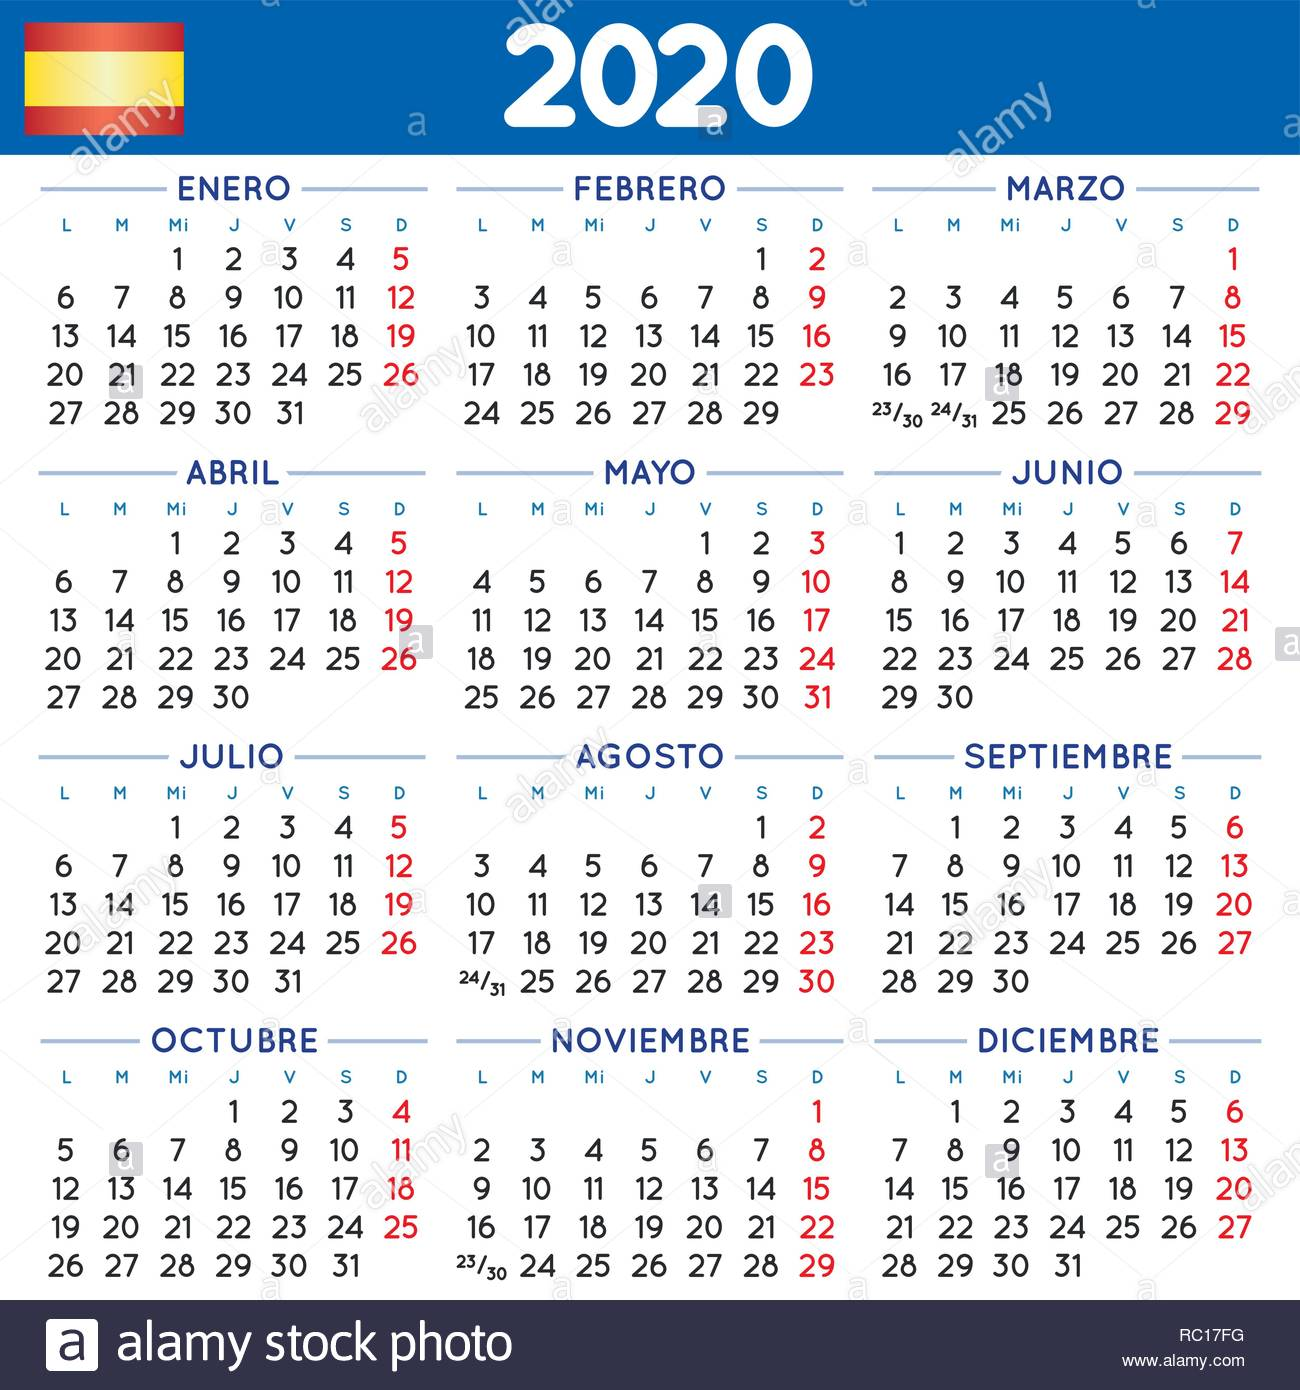 Calendario 2020 2020.2020 Elegant Squared Calendar In Spanish Year 2020 Calendar